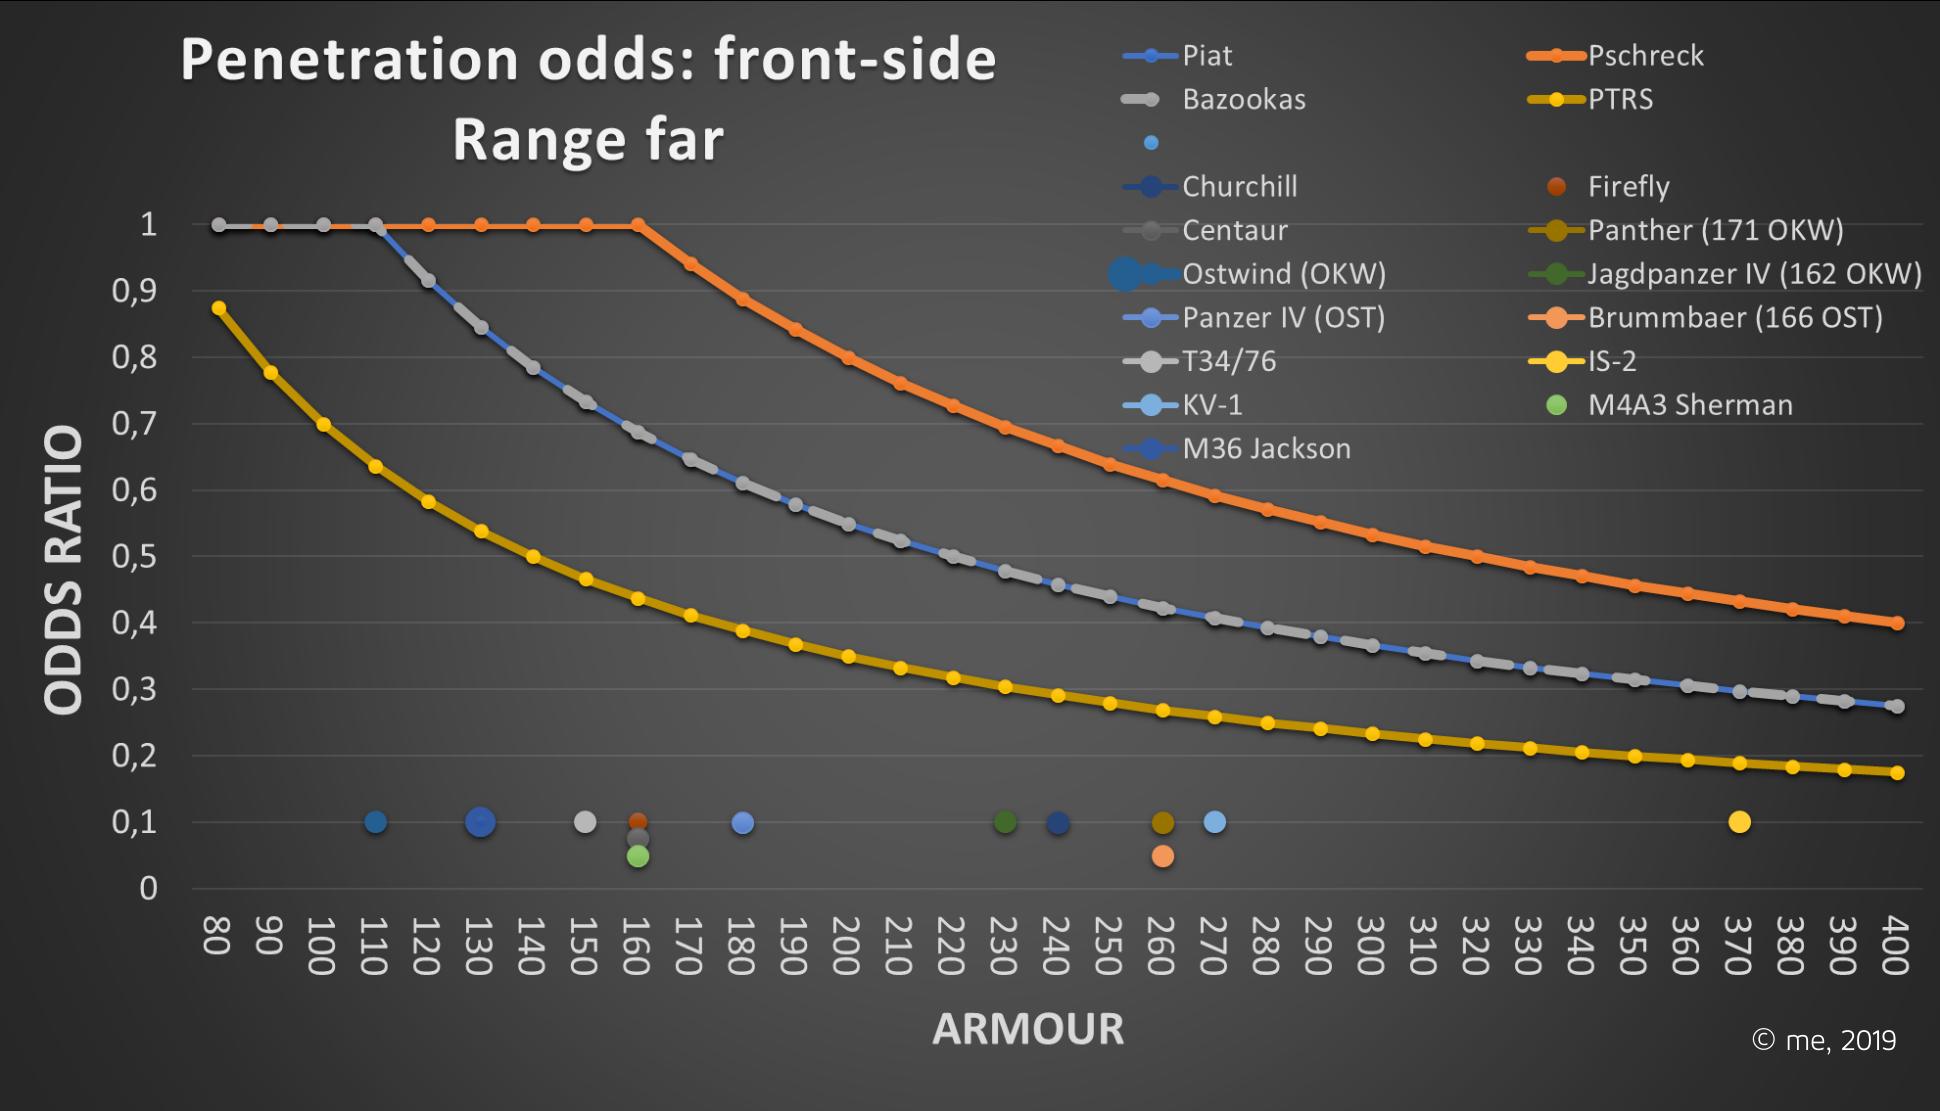 Armour penetration